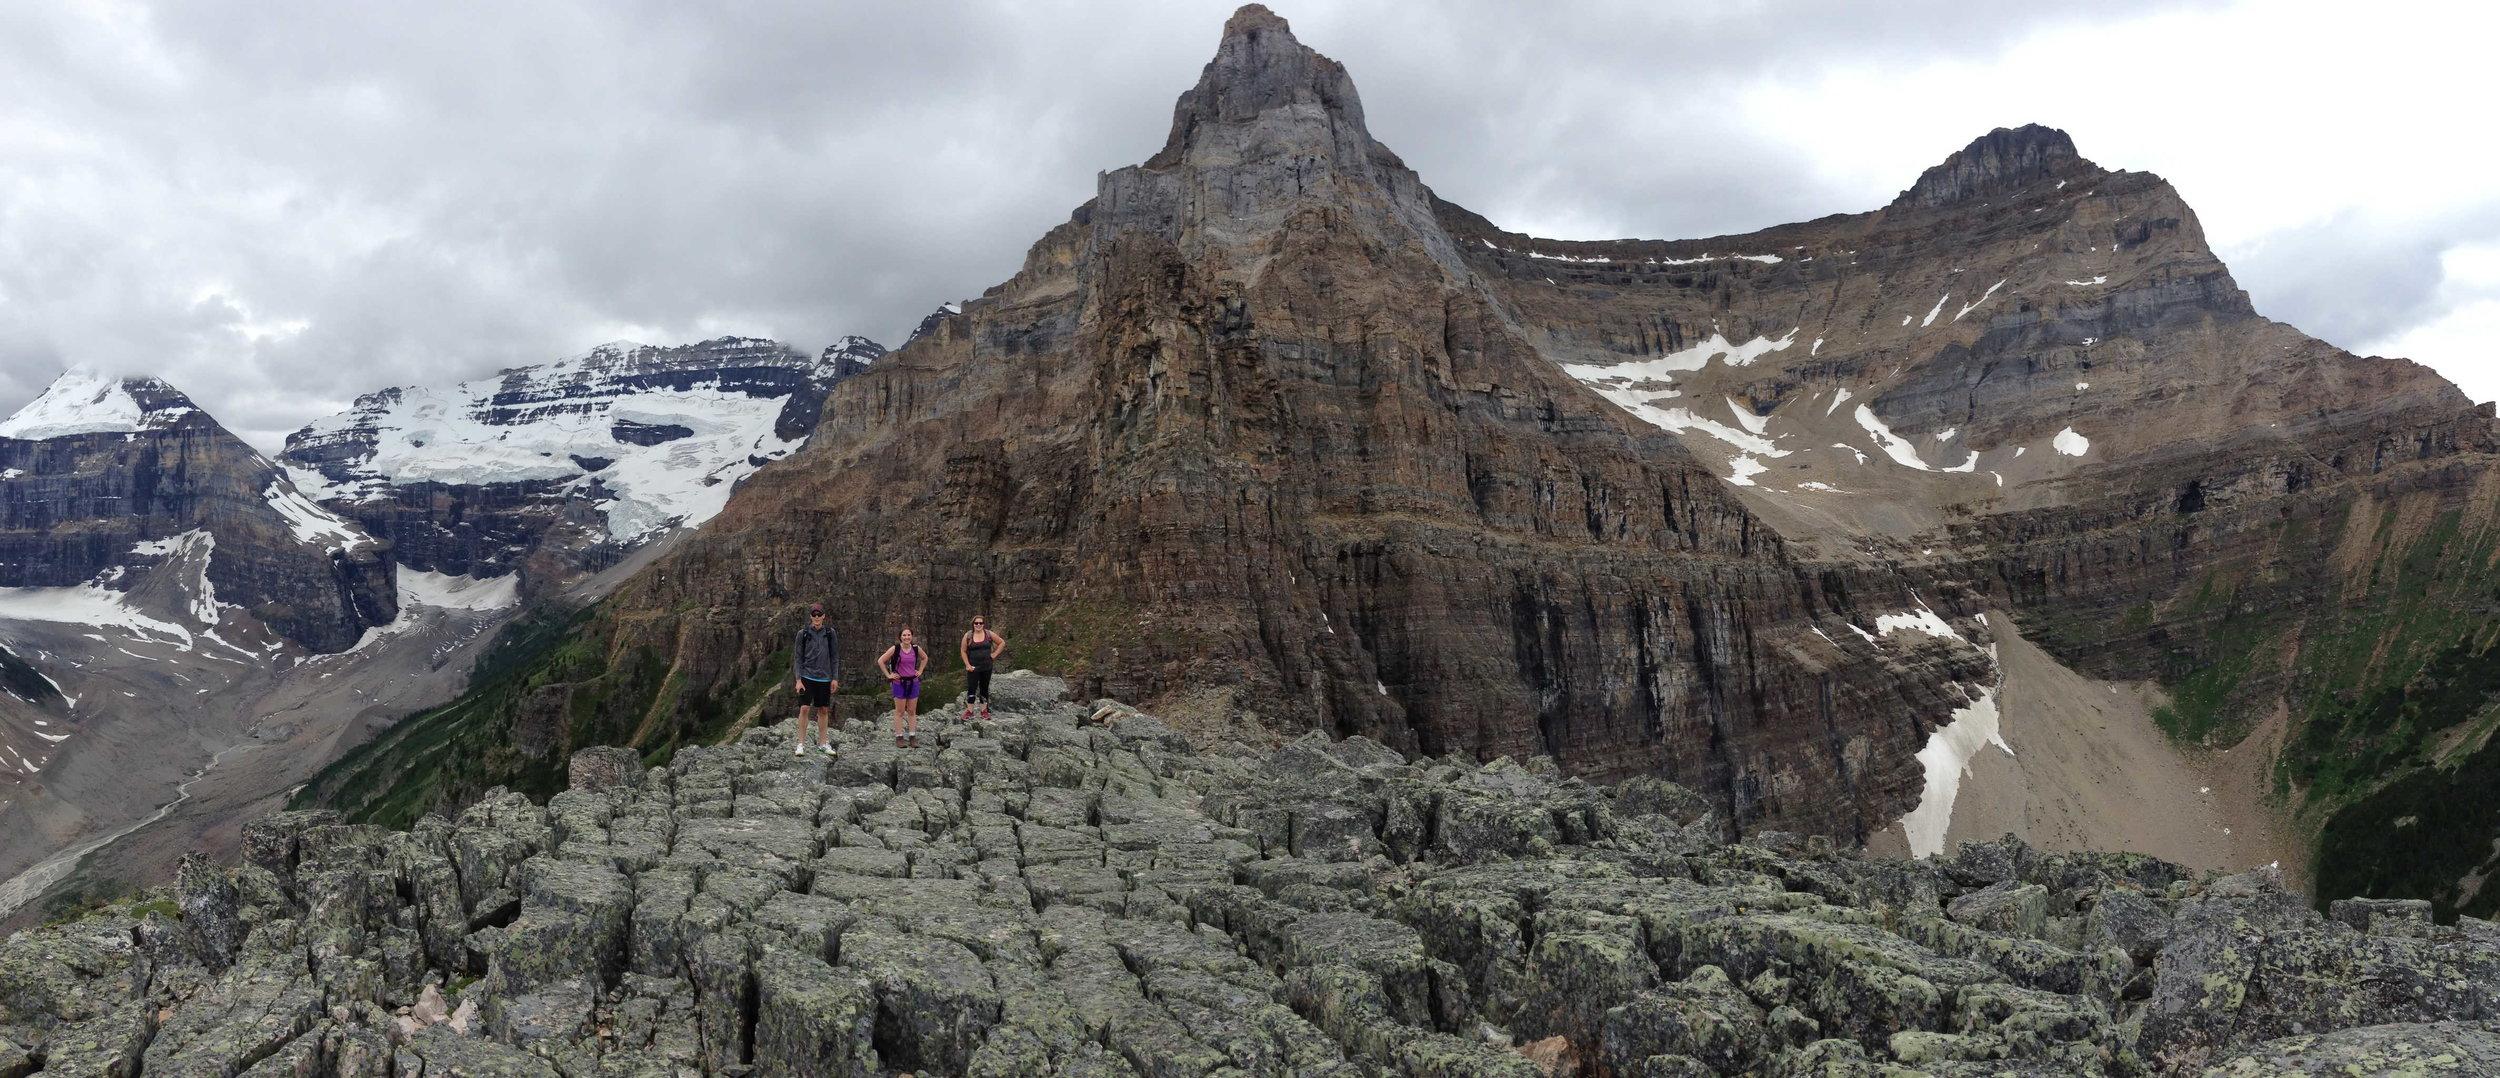 Summit of Devil's Thumb, Lake Louise